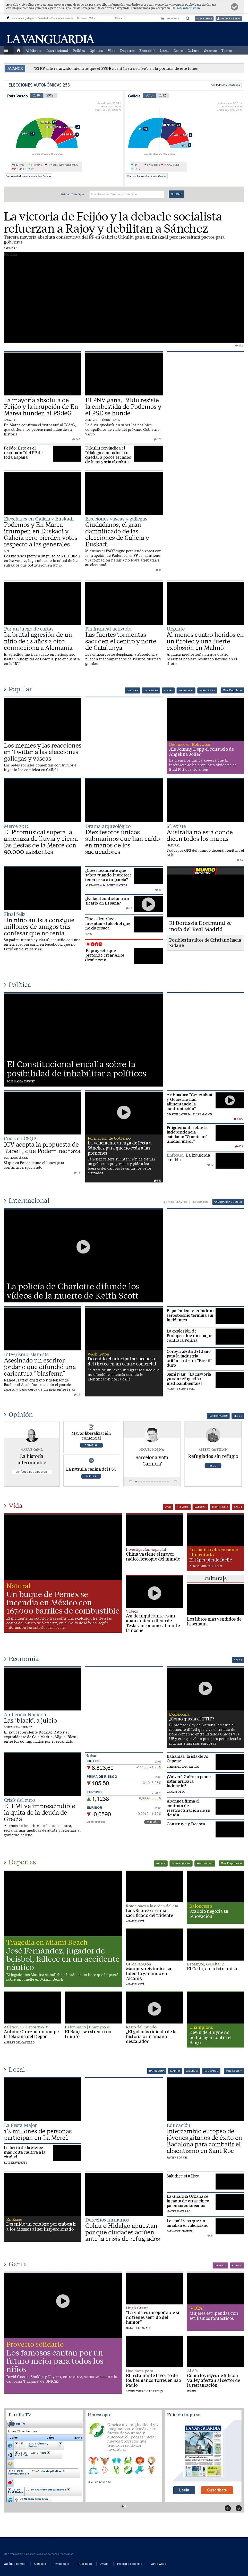 La Vanguardia at Sunday Sept. 25, 2016, 11:25 p.m. UTC